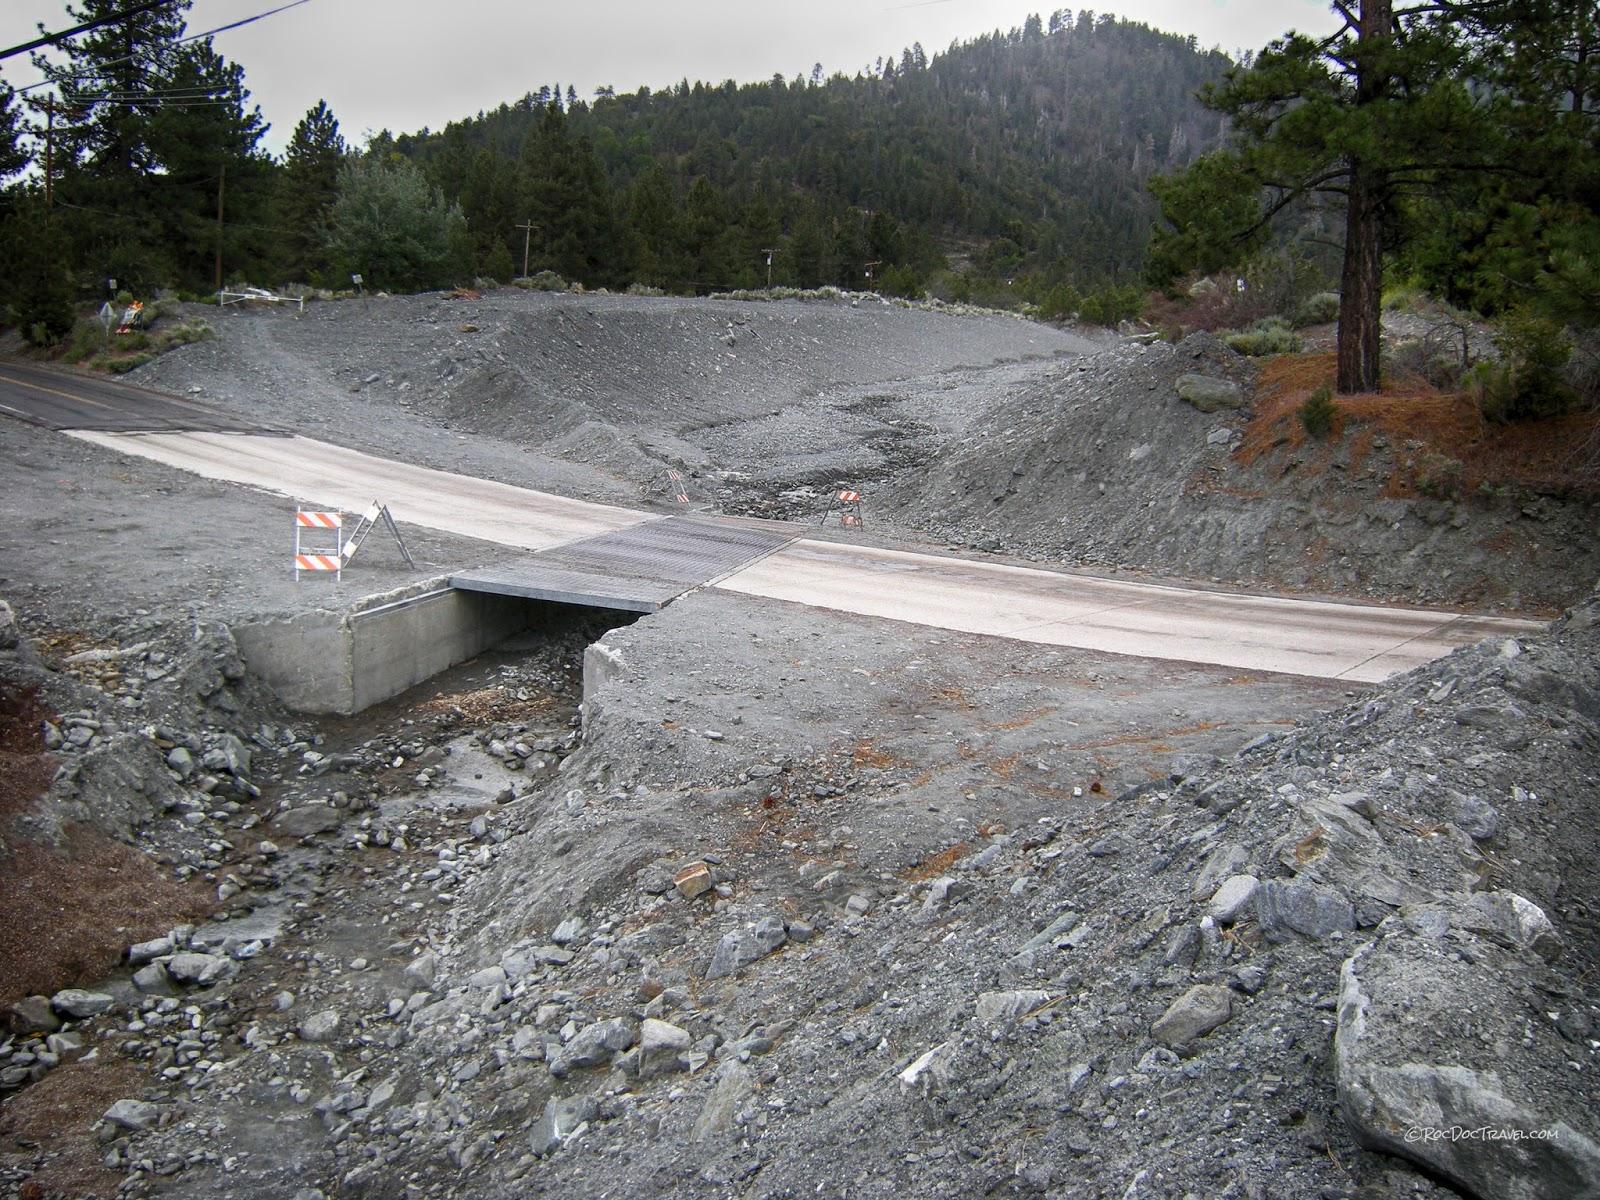 California Landslides & Floods - Roc Doc Travel